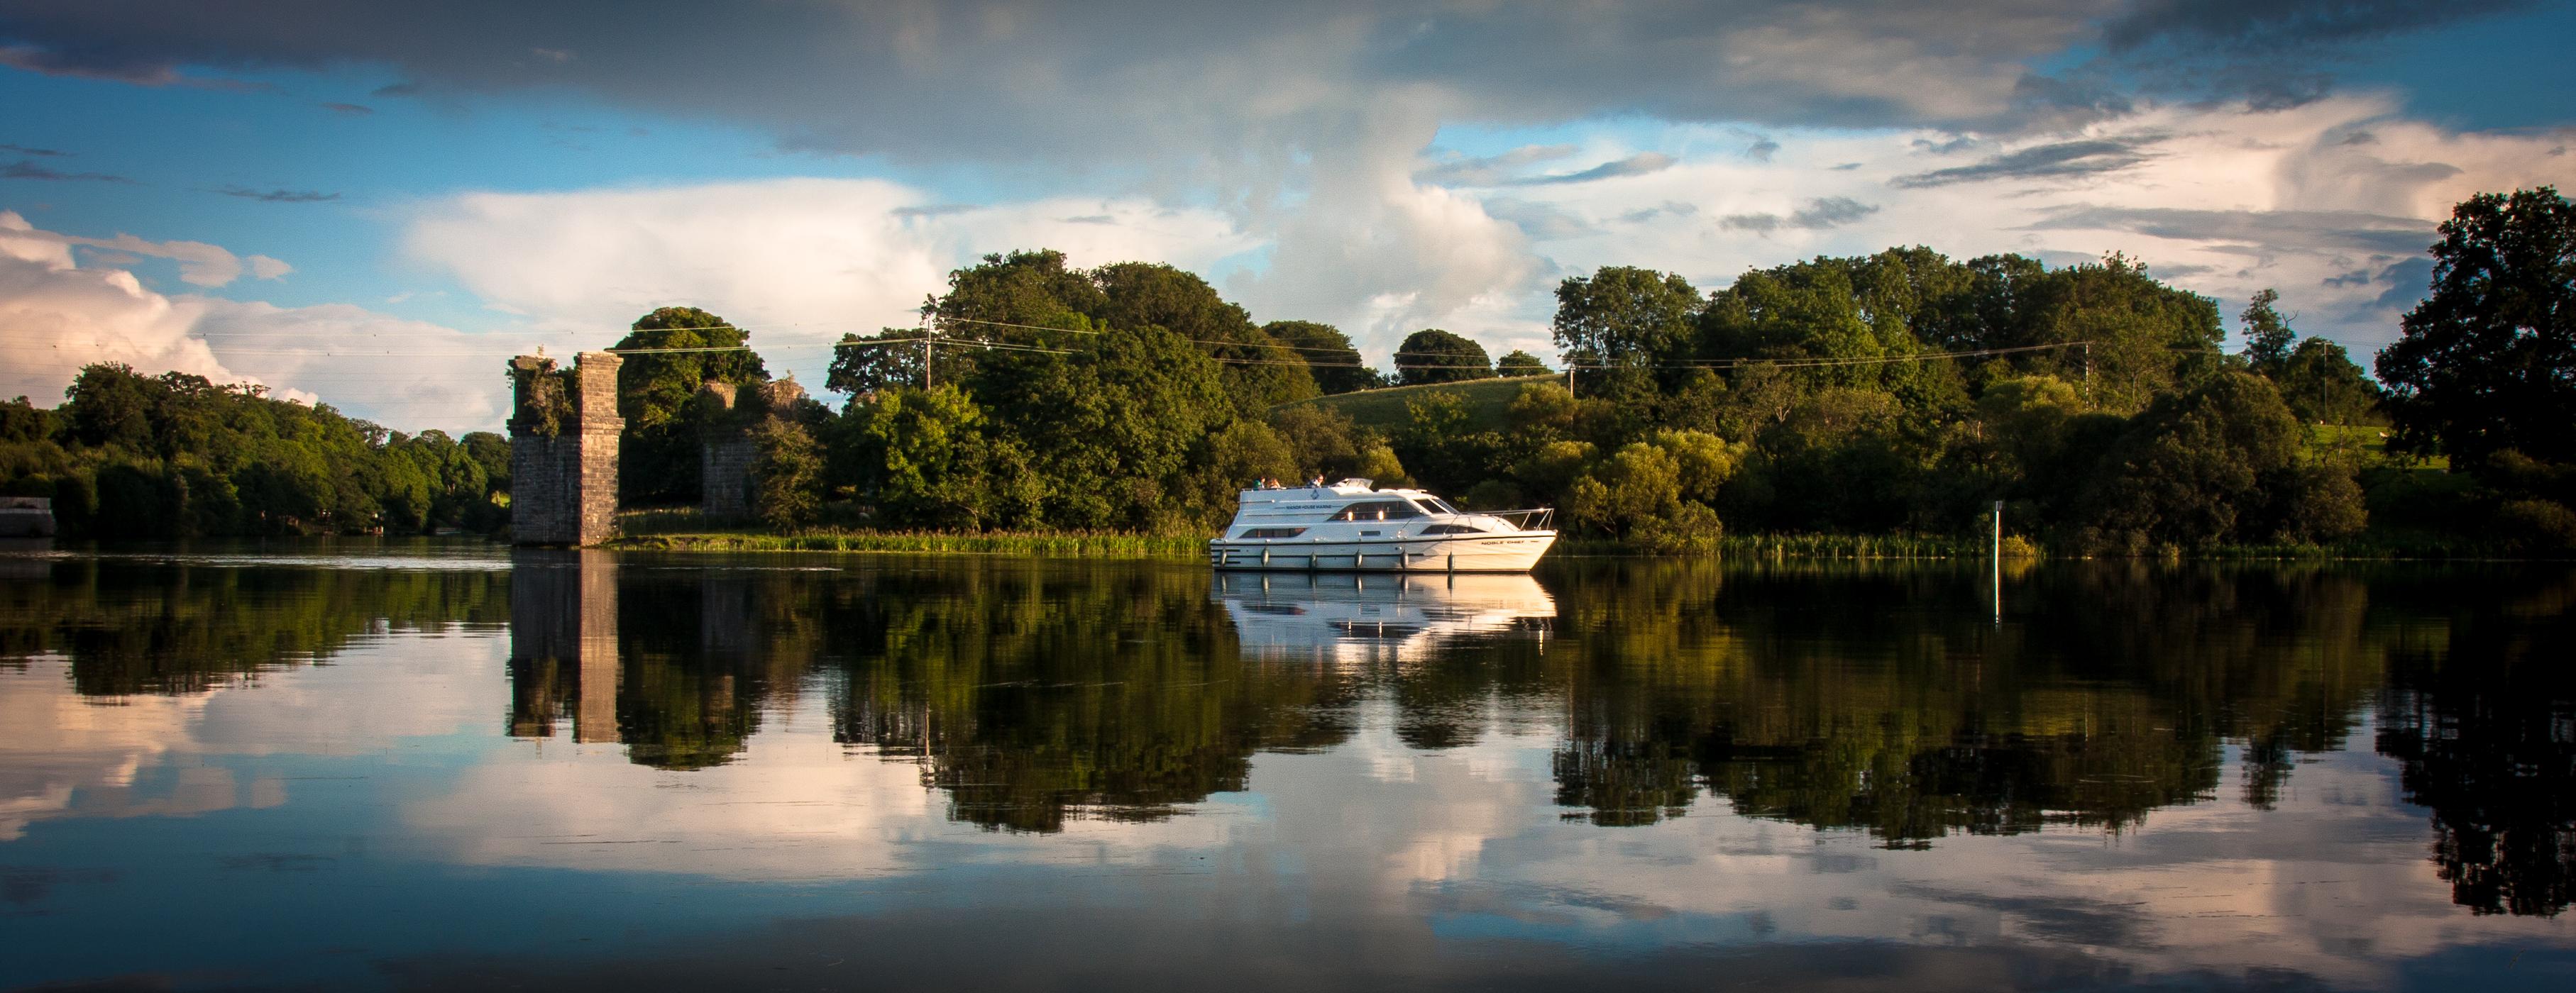 Cruising by Terry McCartney_Enniskillen.jpg